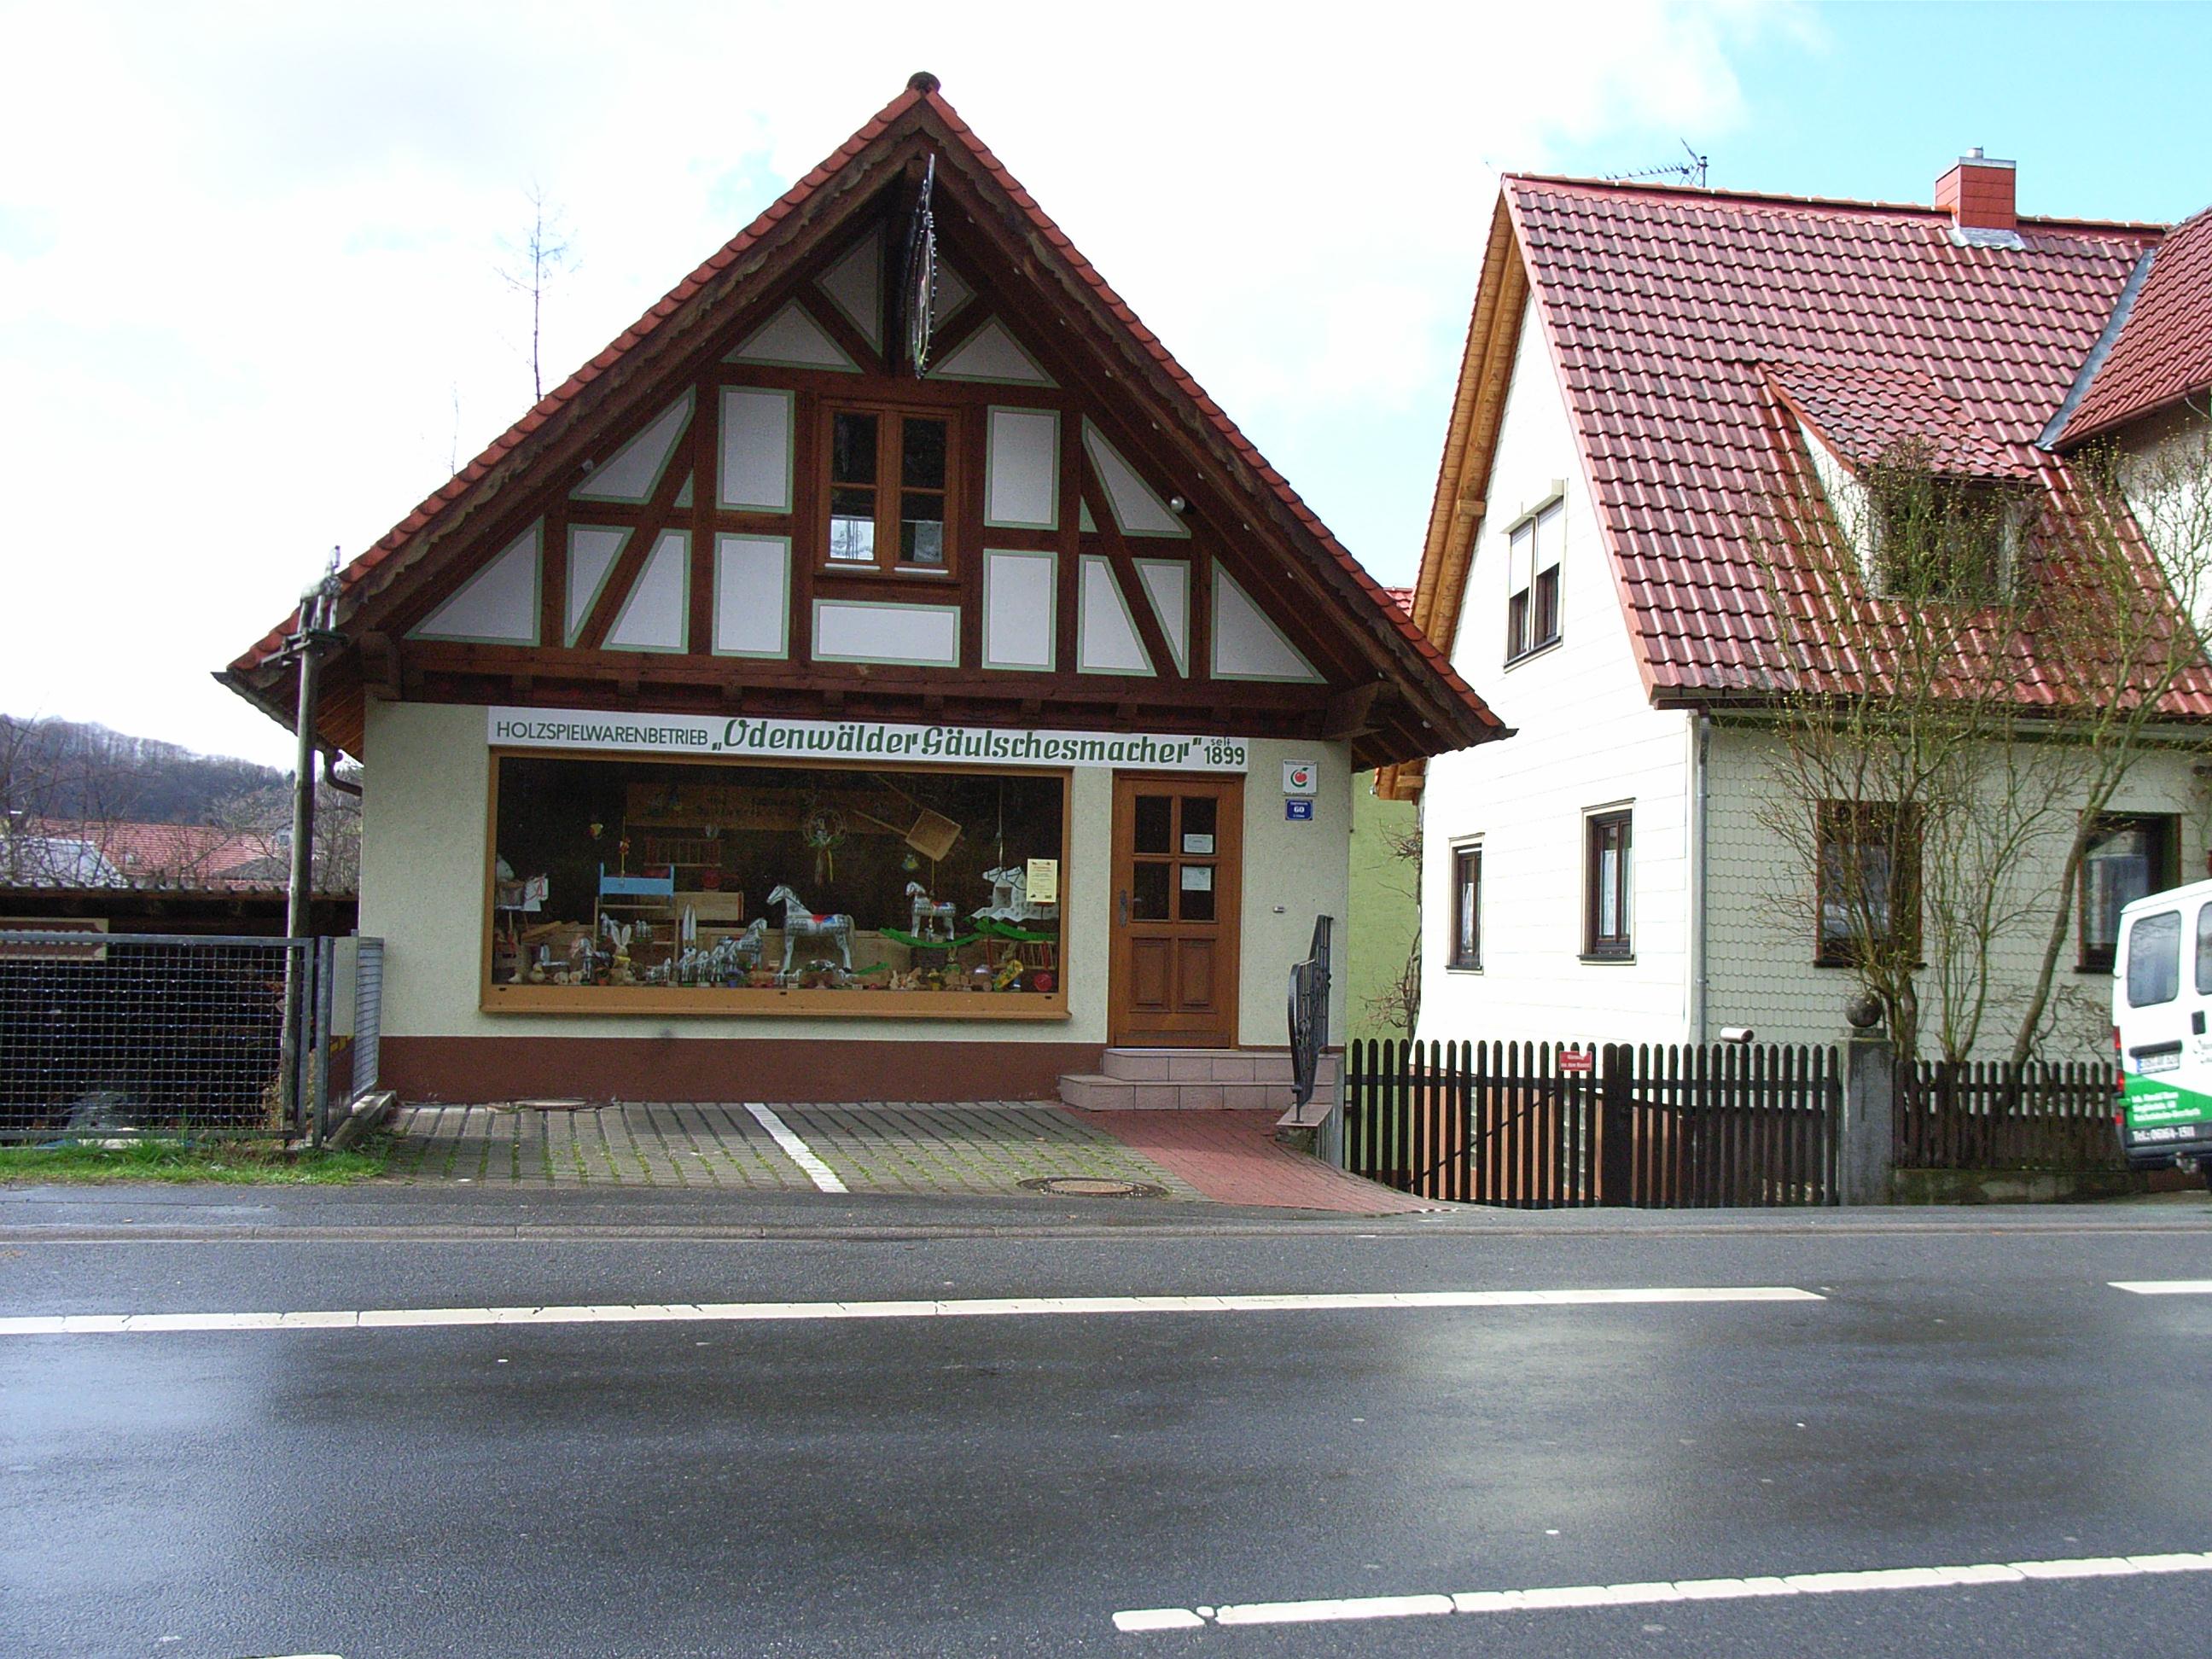 Holzspielwaren Anette Krämer